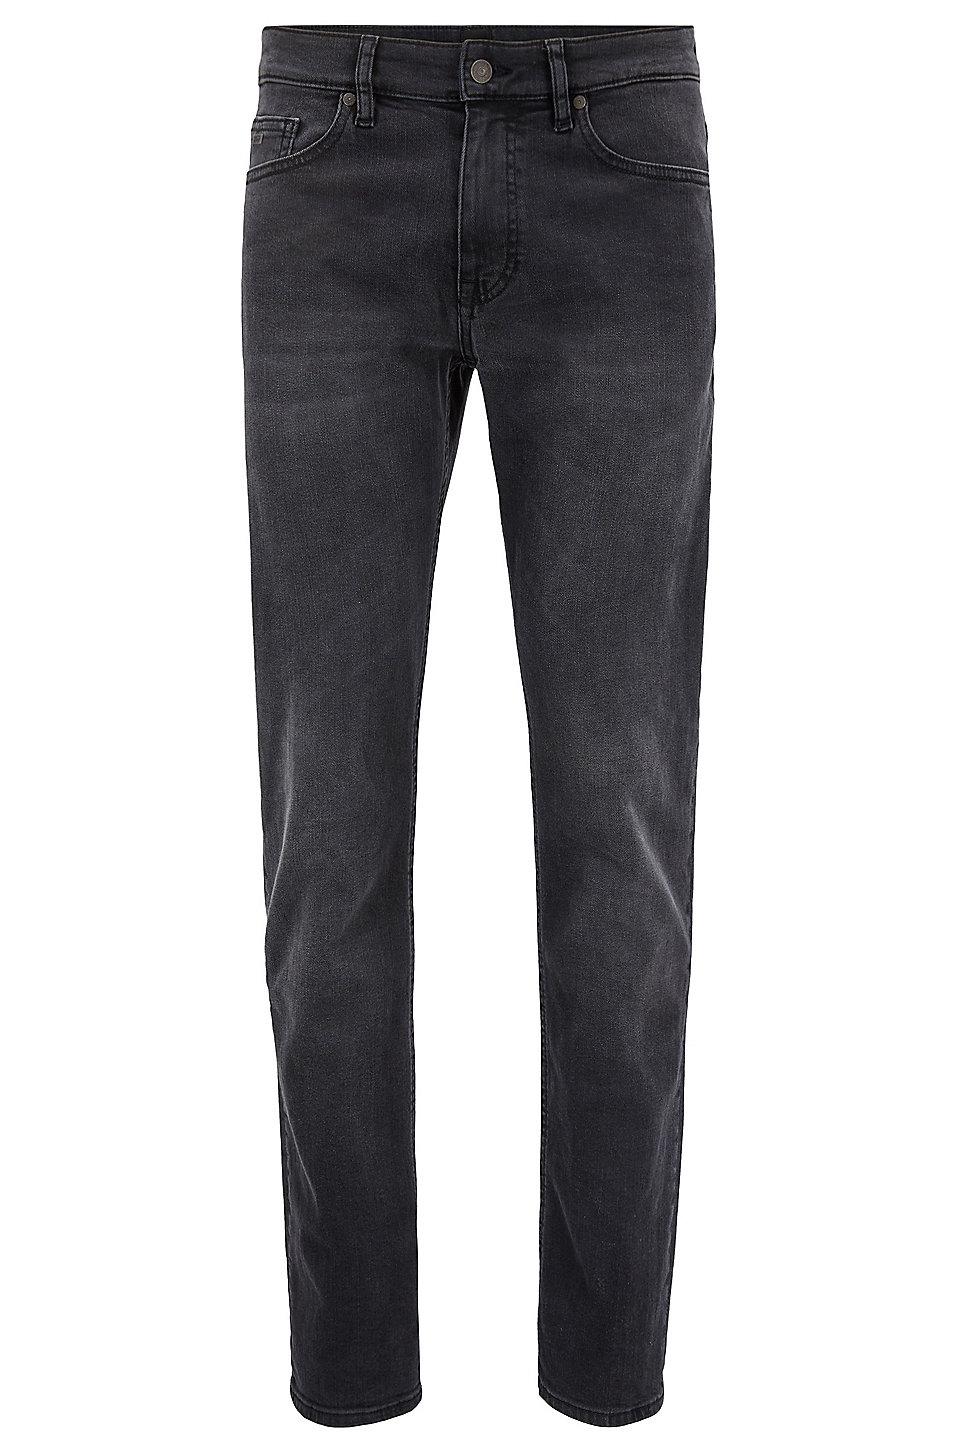 71342b98d6de BOSS - Slim-Fit Jeans aus Super-Stretch-Denim